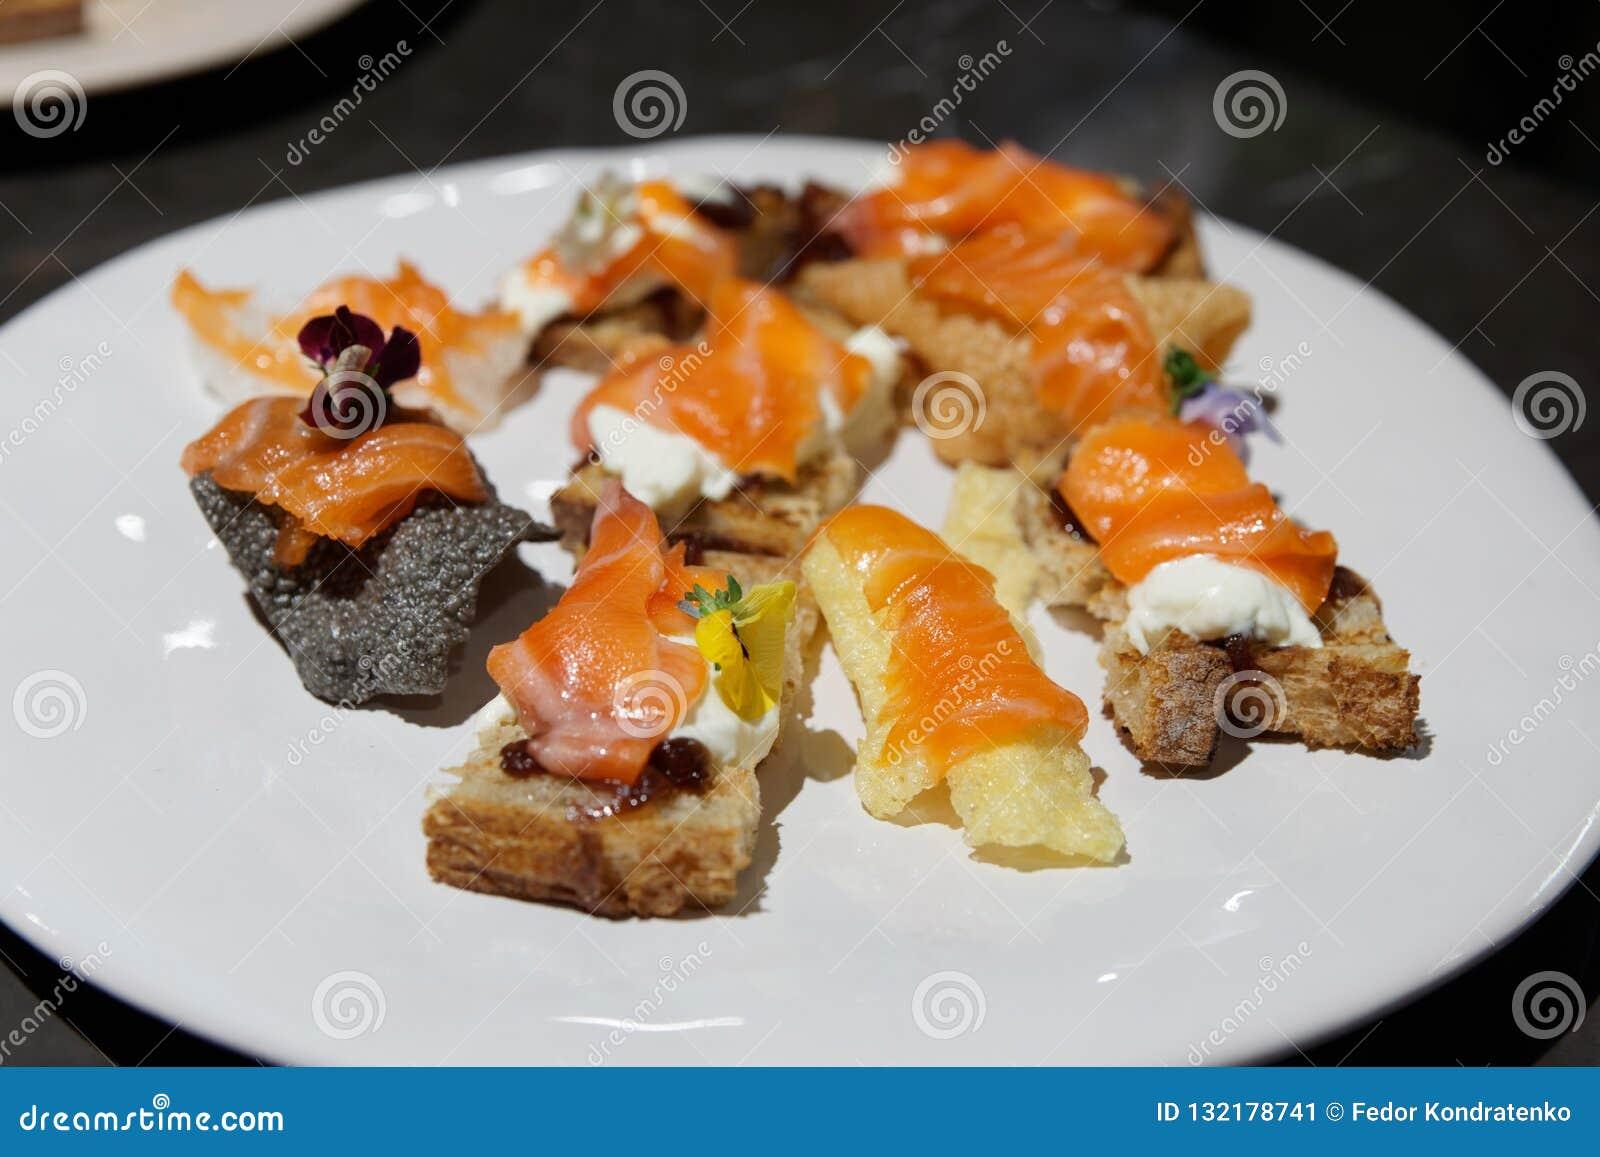 Pan con de color salmón - pequeños bocados